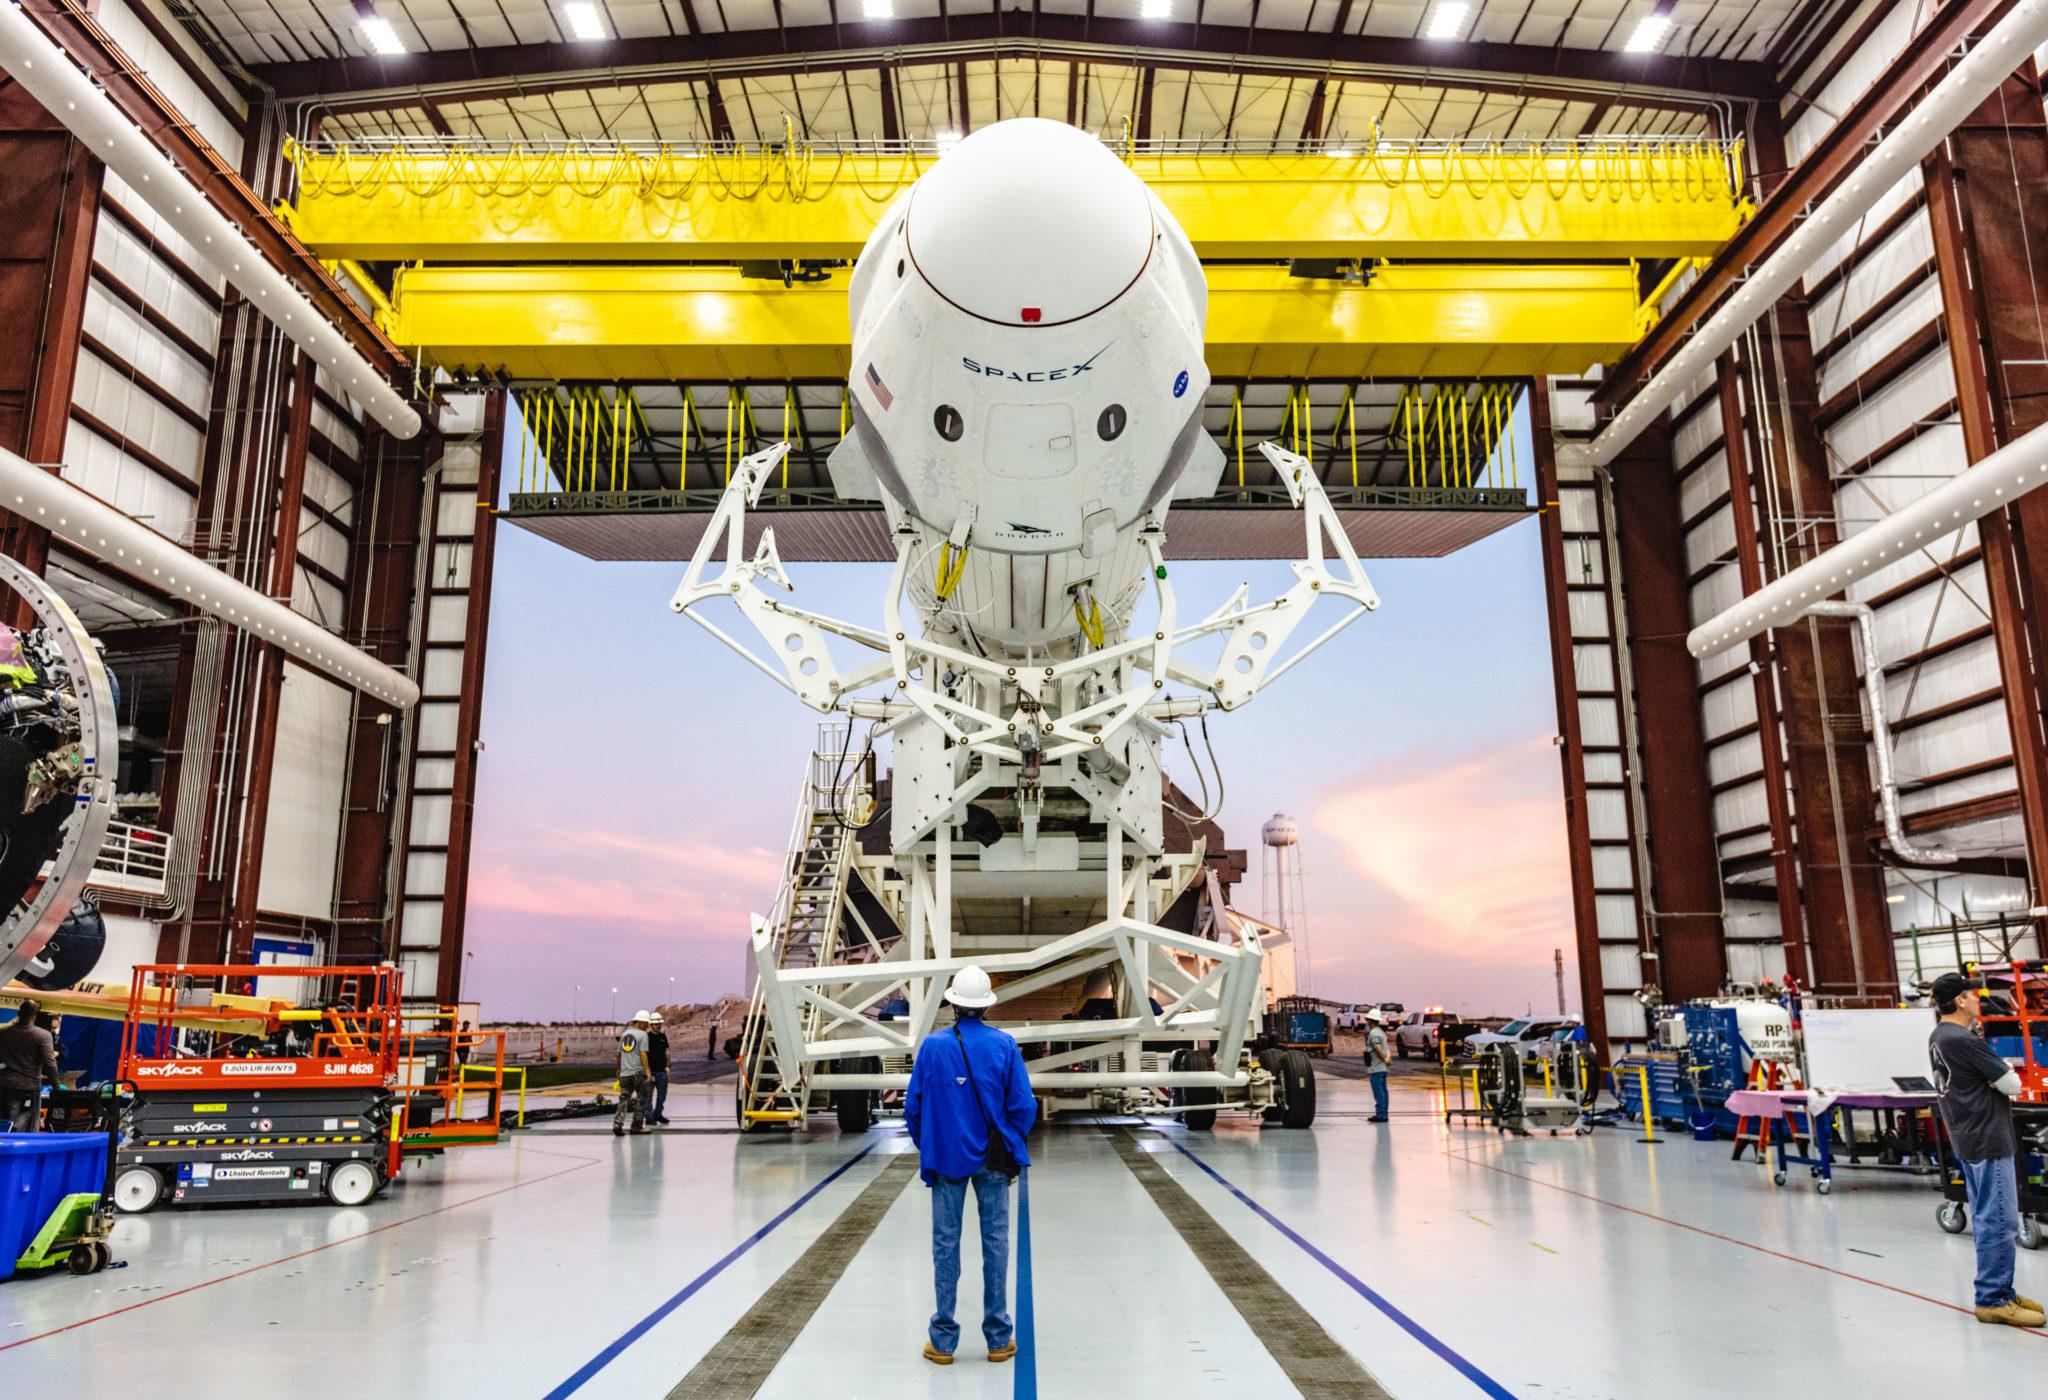 SpaceX Crew Dragon